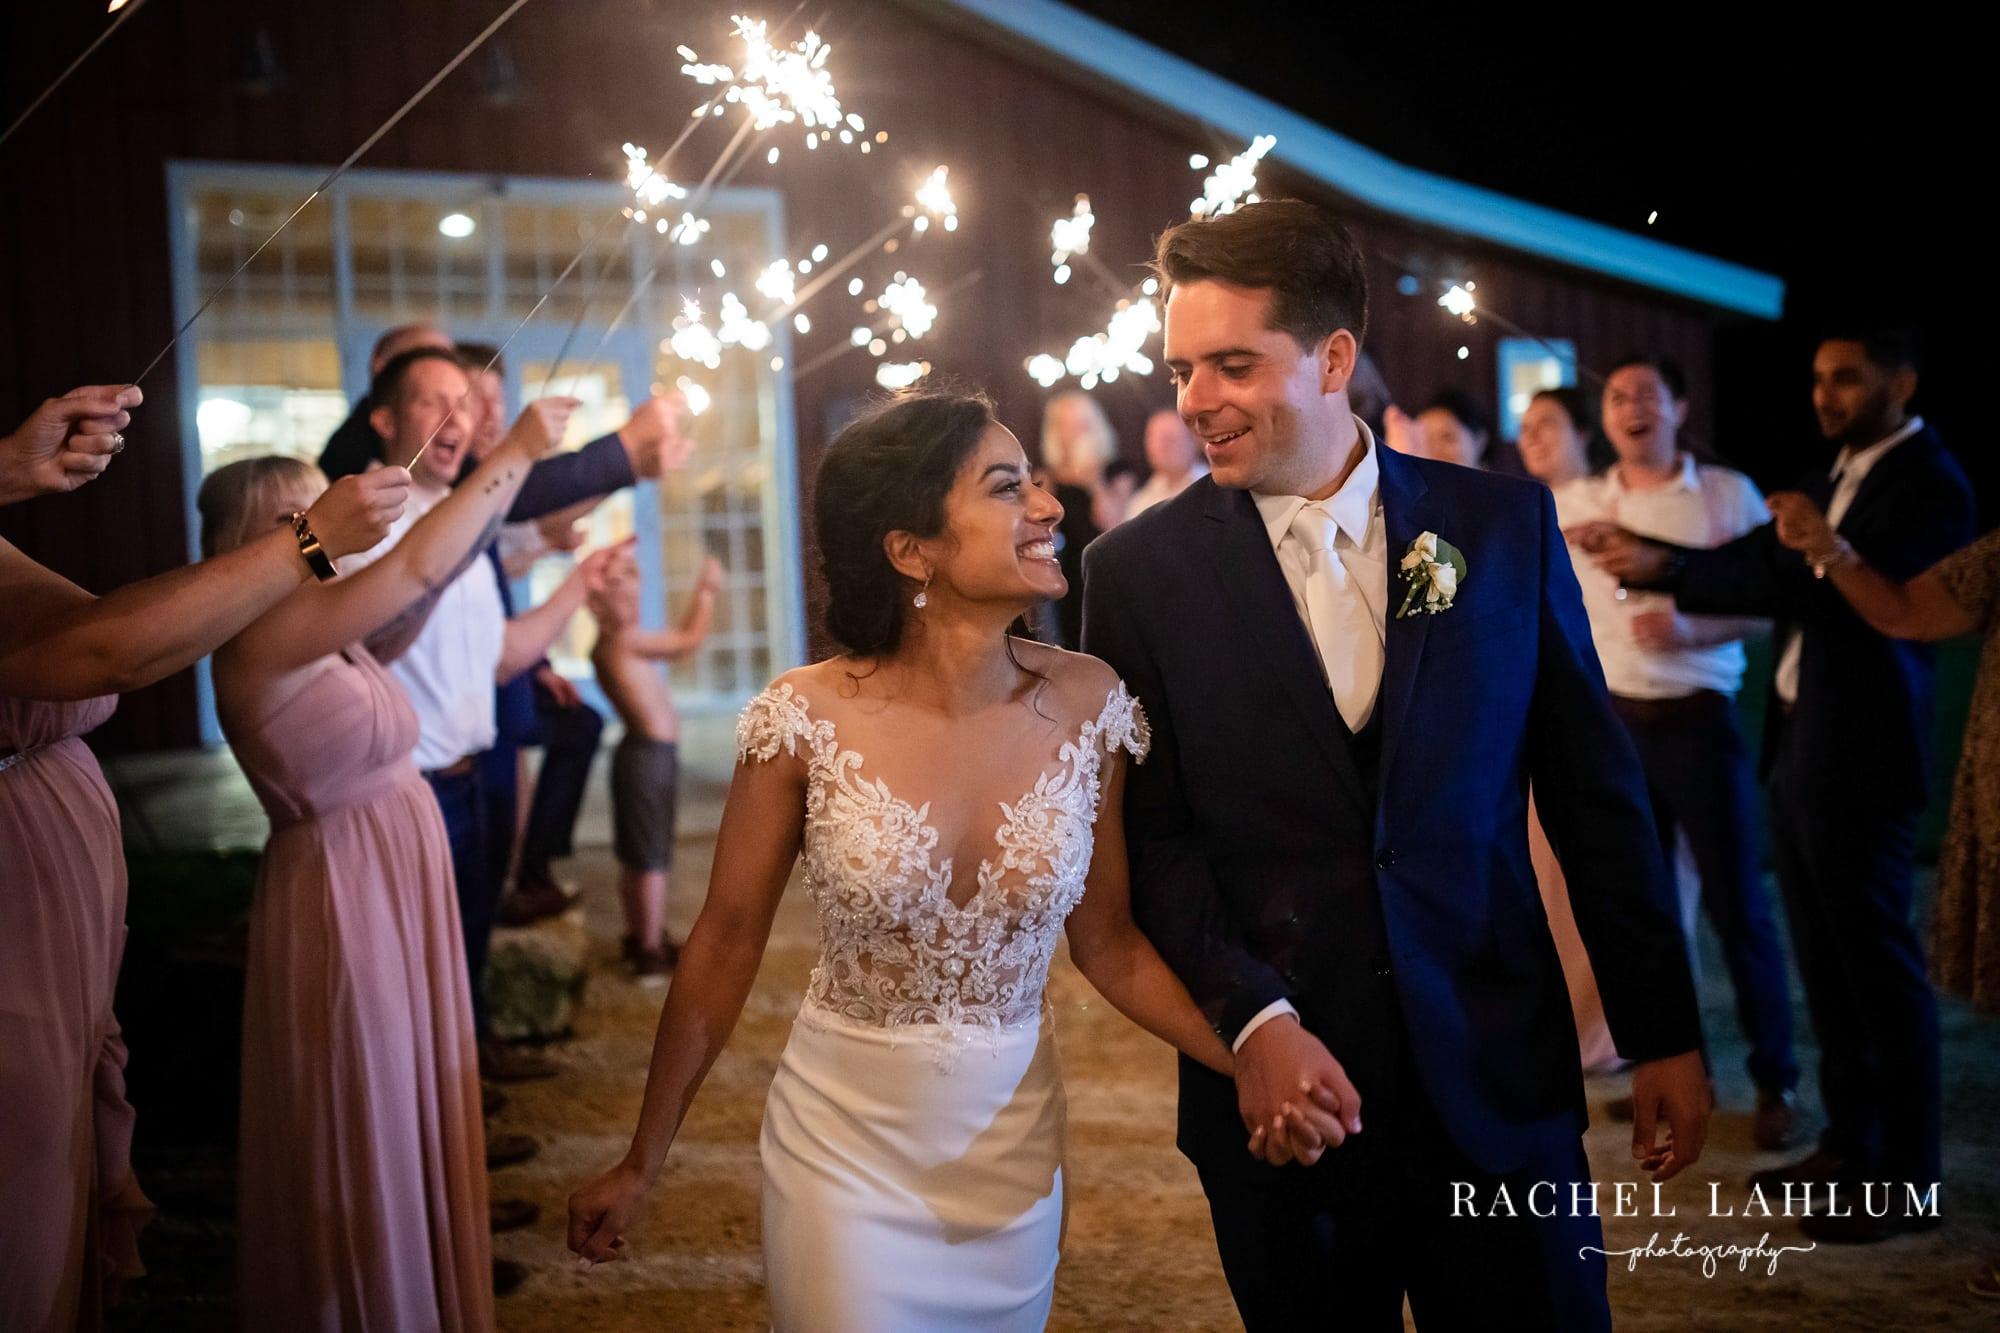 Bride and groom walk through sparkler tunnel.